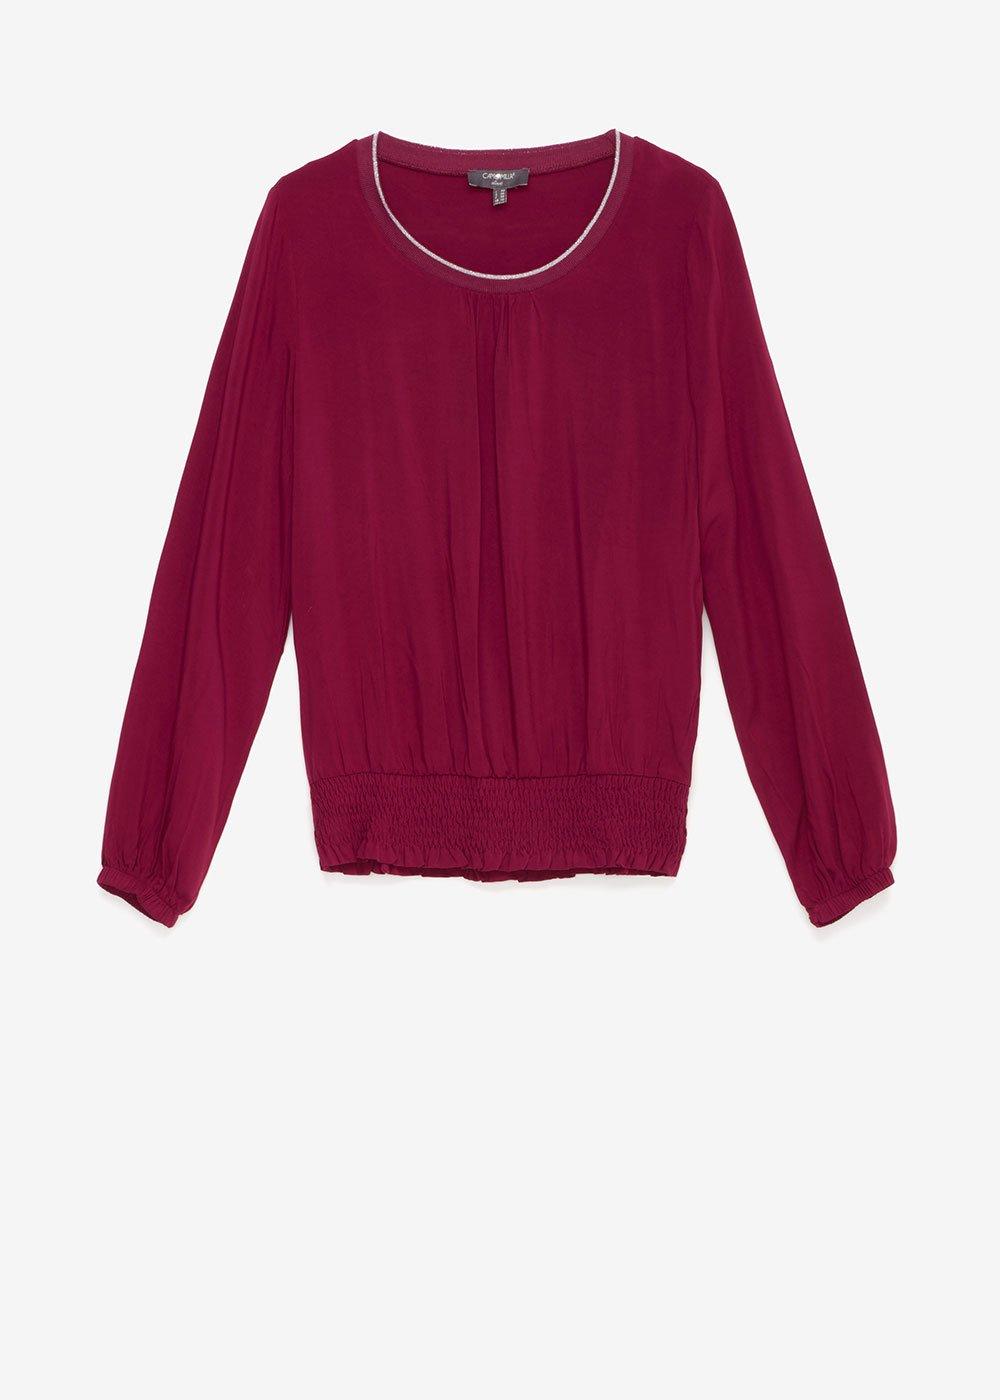 T-shirt Samantha scollo tondo - Rosee' - Donna